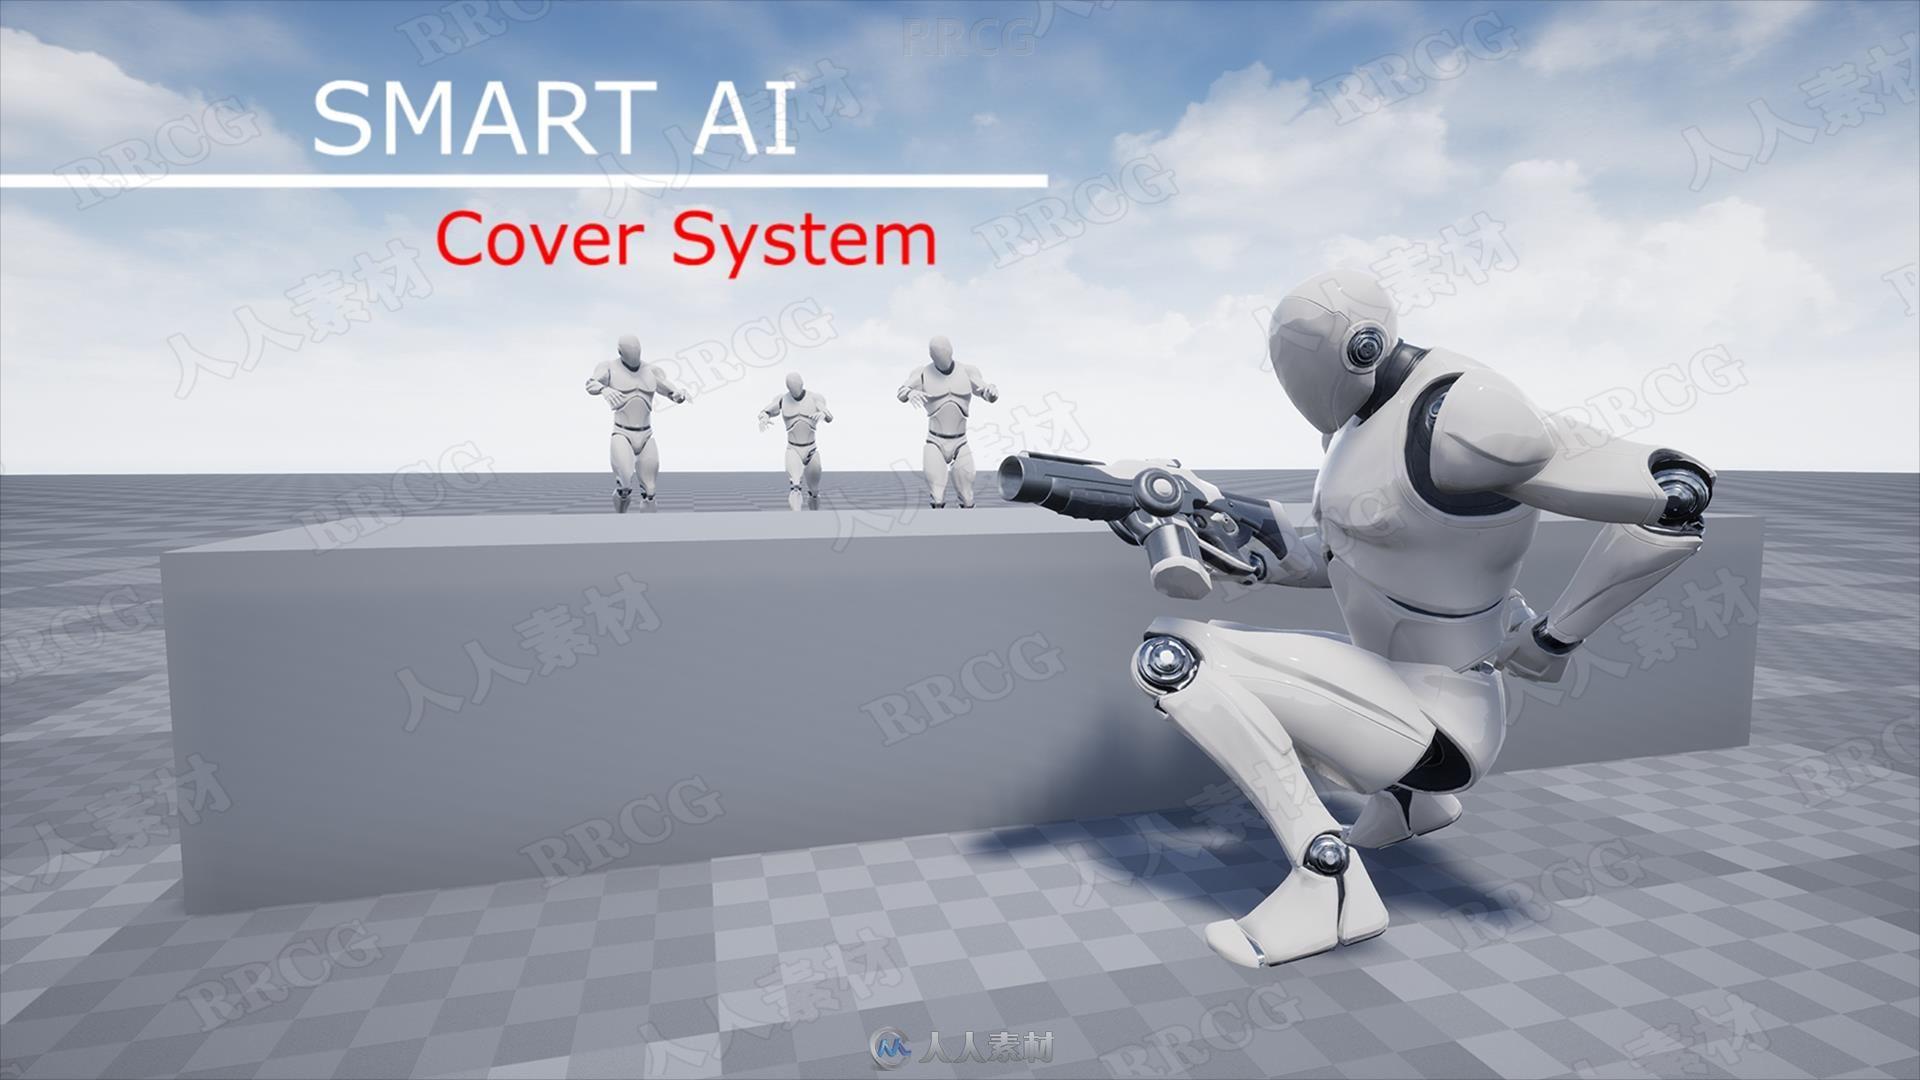 人工智能系统工具Unreal Engine游戏素材资源